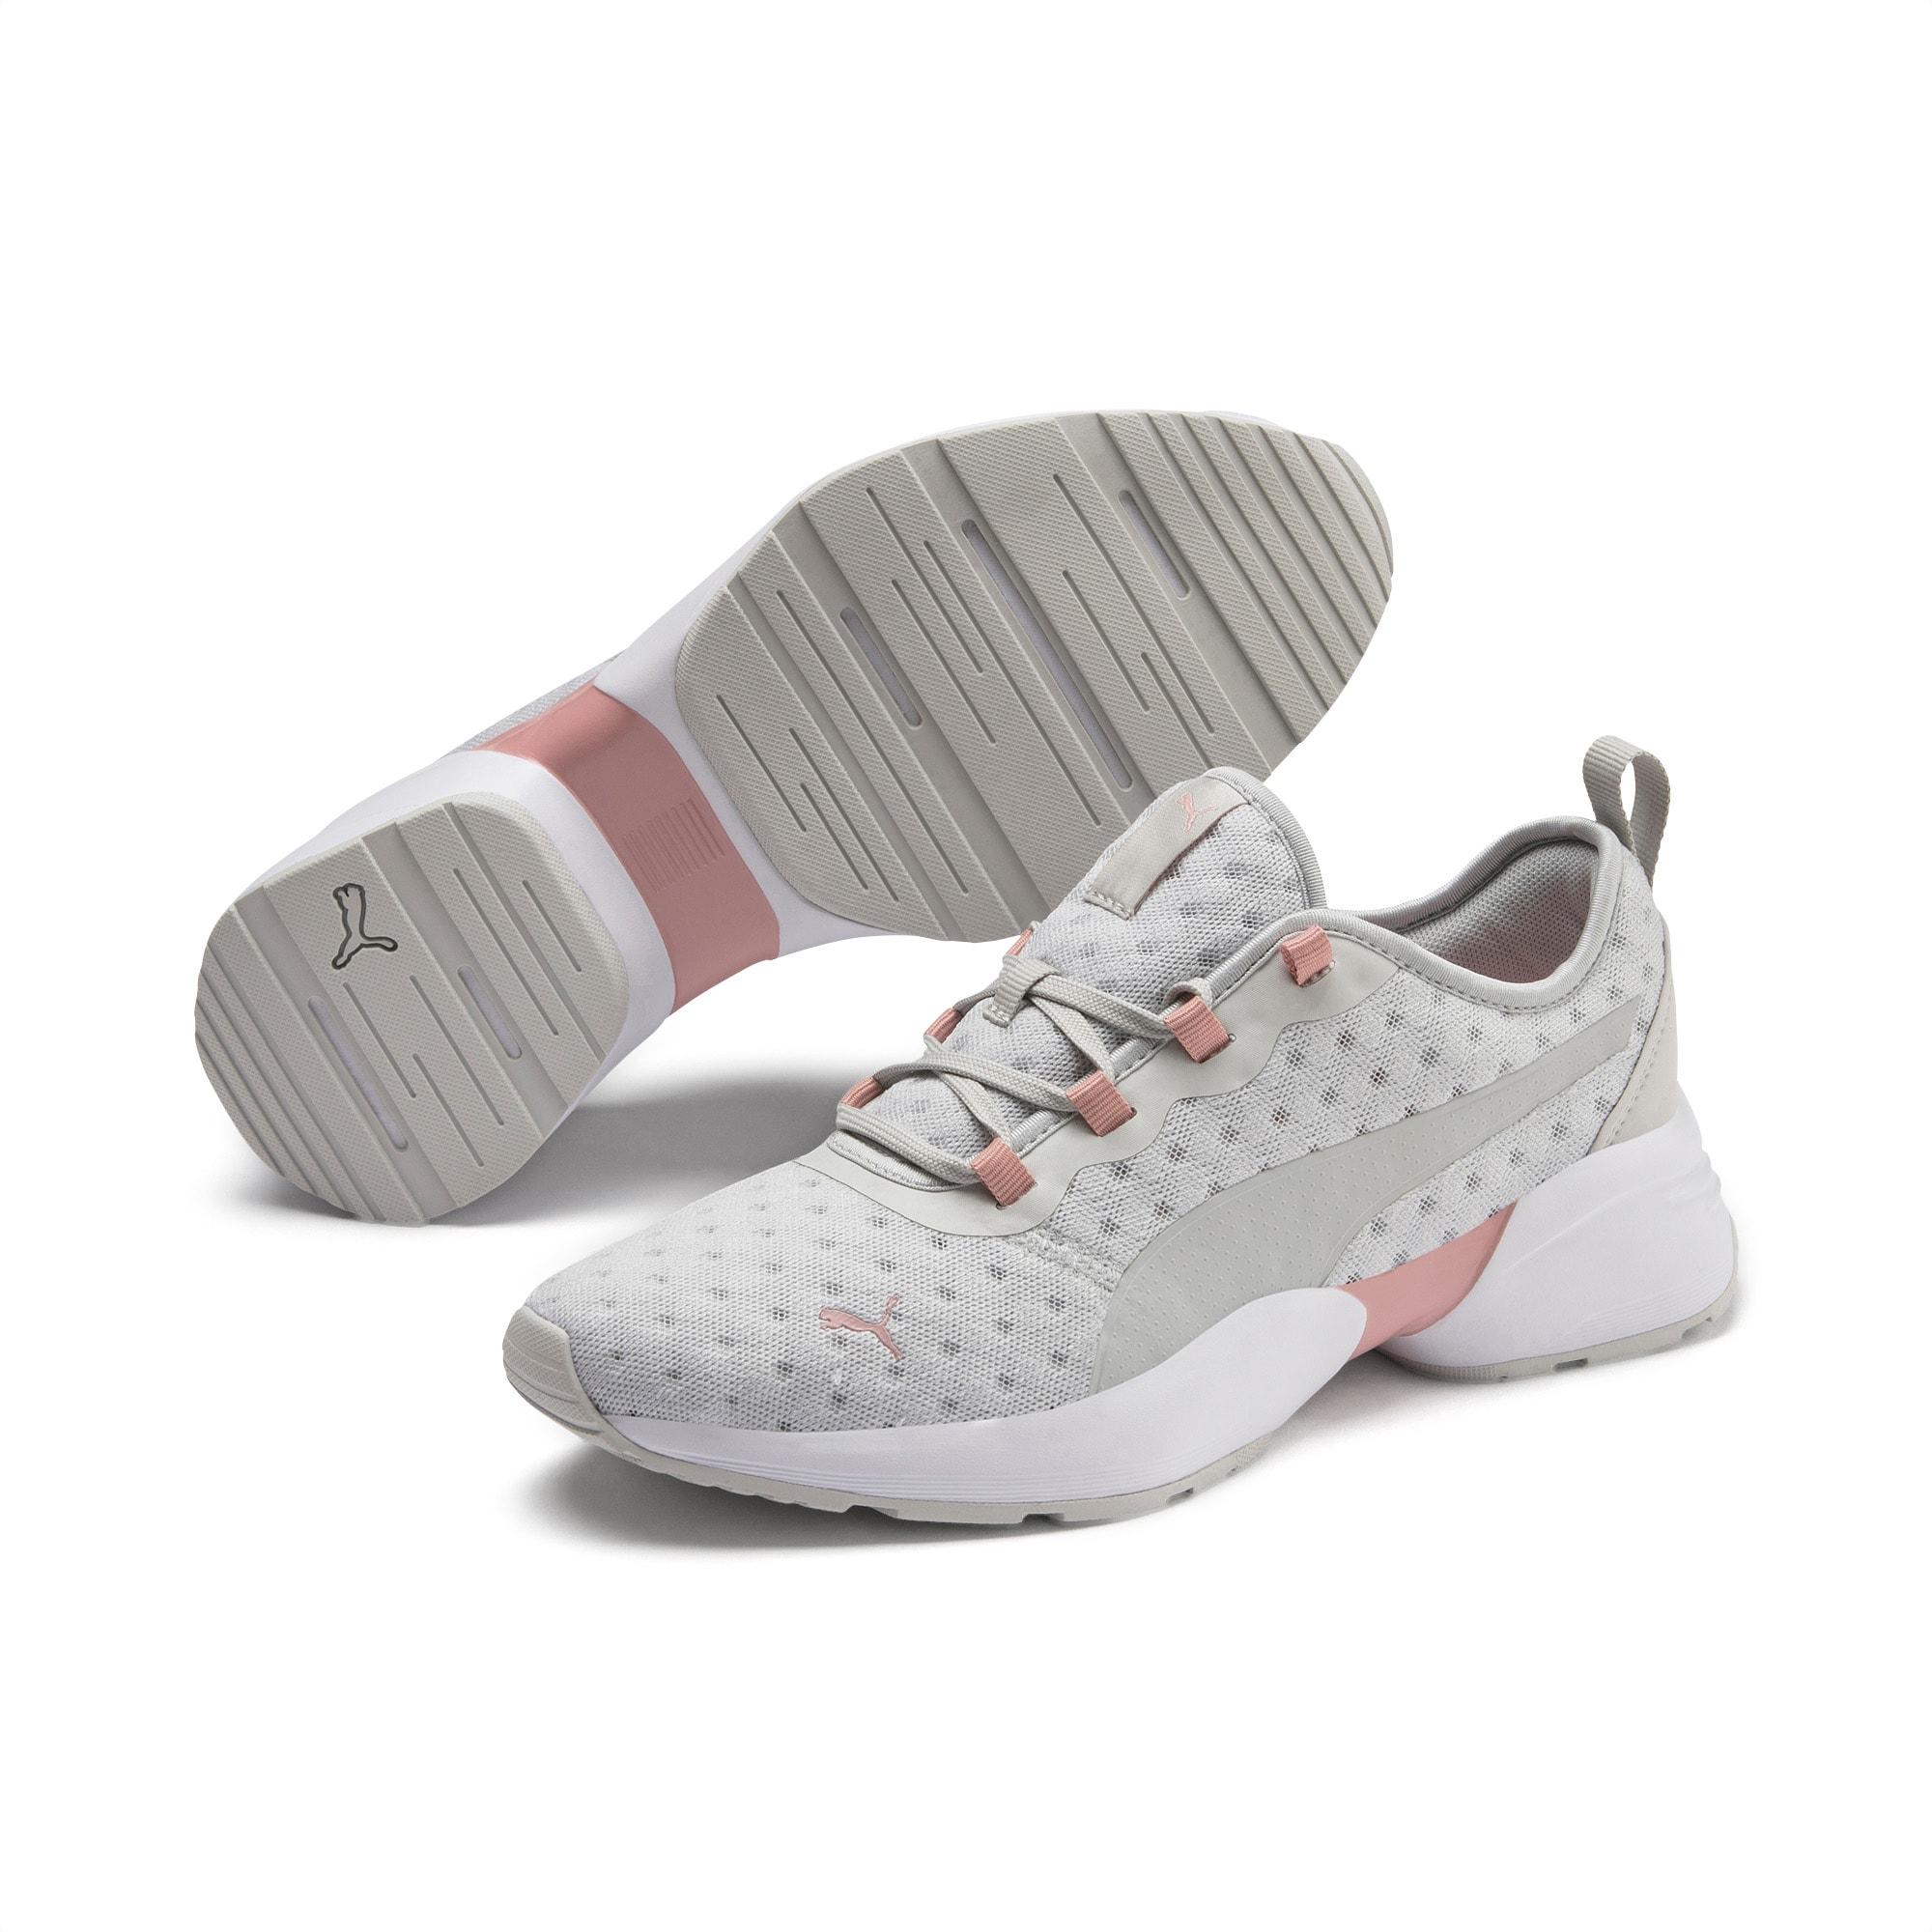 puma scarpe donna pois